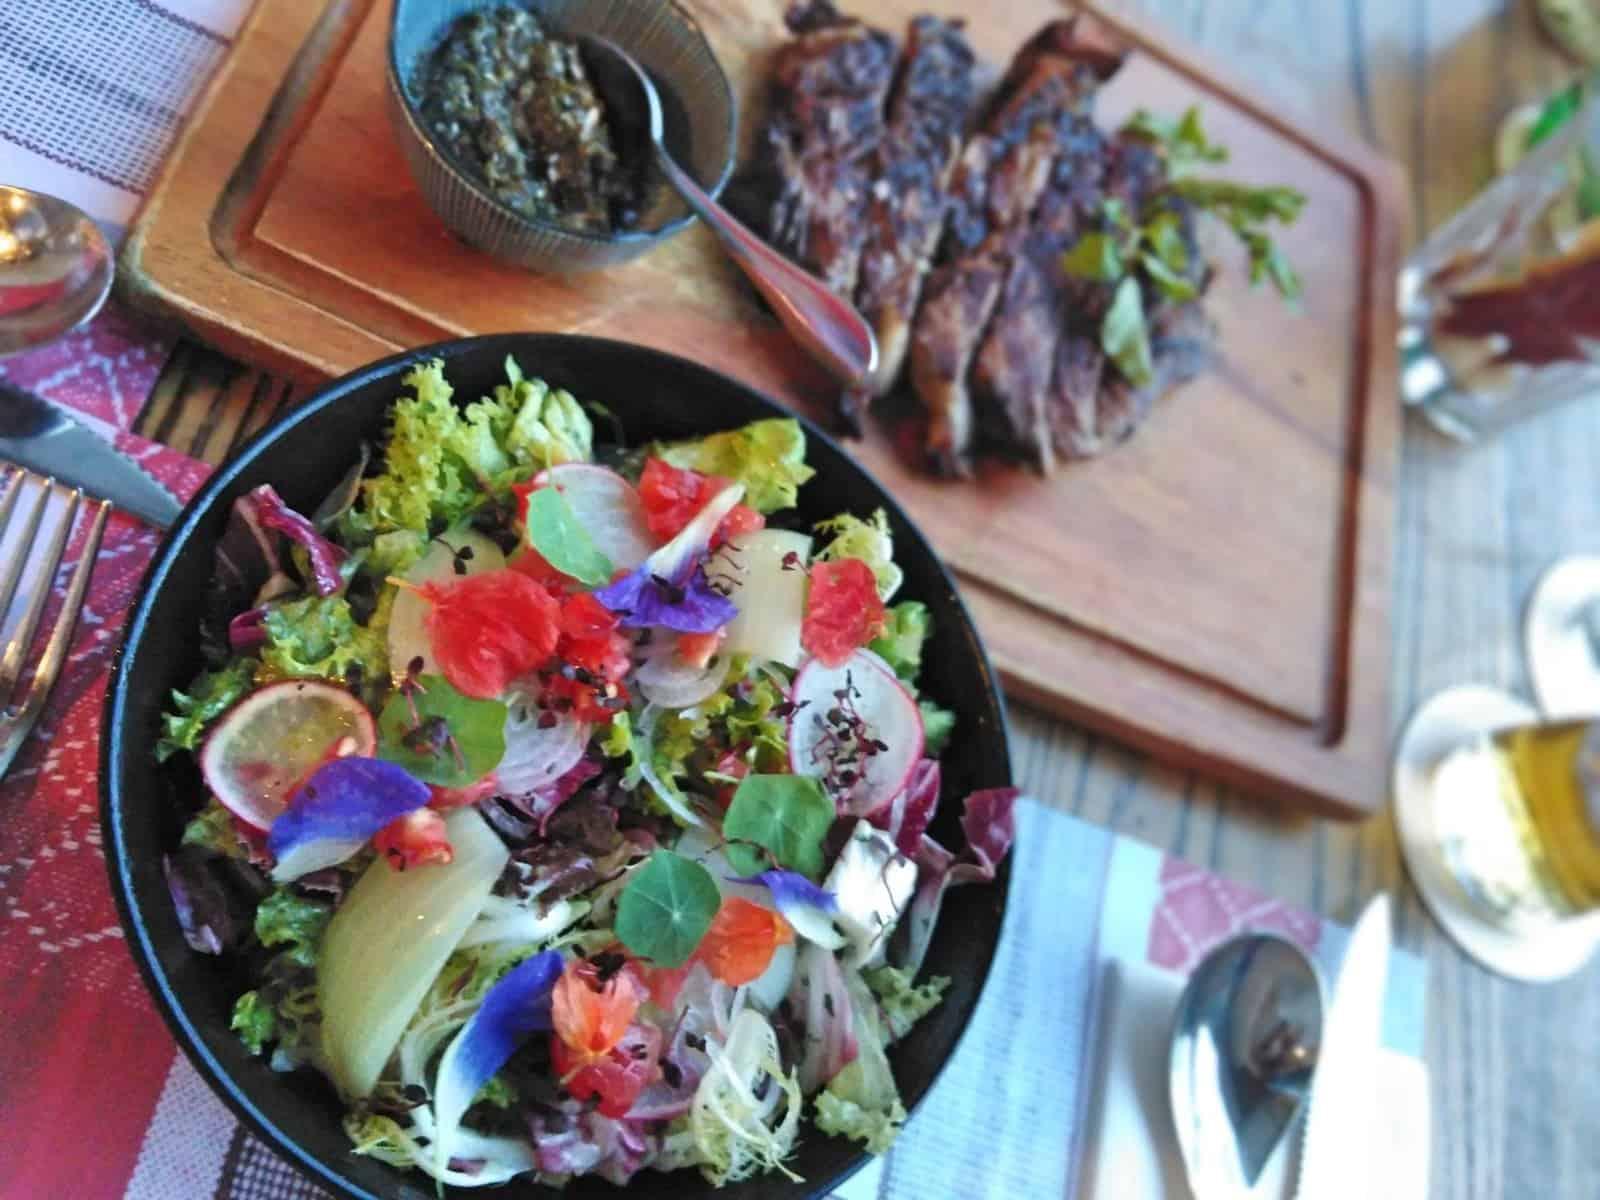 Fuegos-modern-South-American-restaurant-KLCC-Kuala-Lumpur-Malaysia-Travel-Mermaid-17